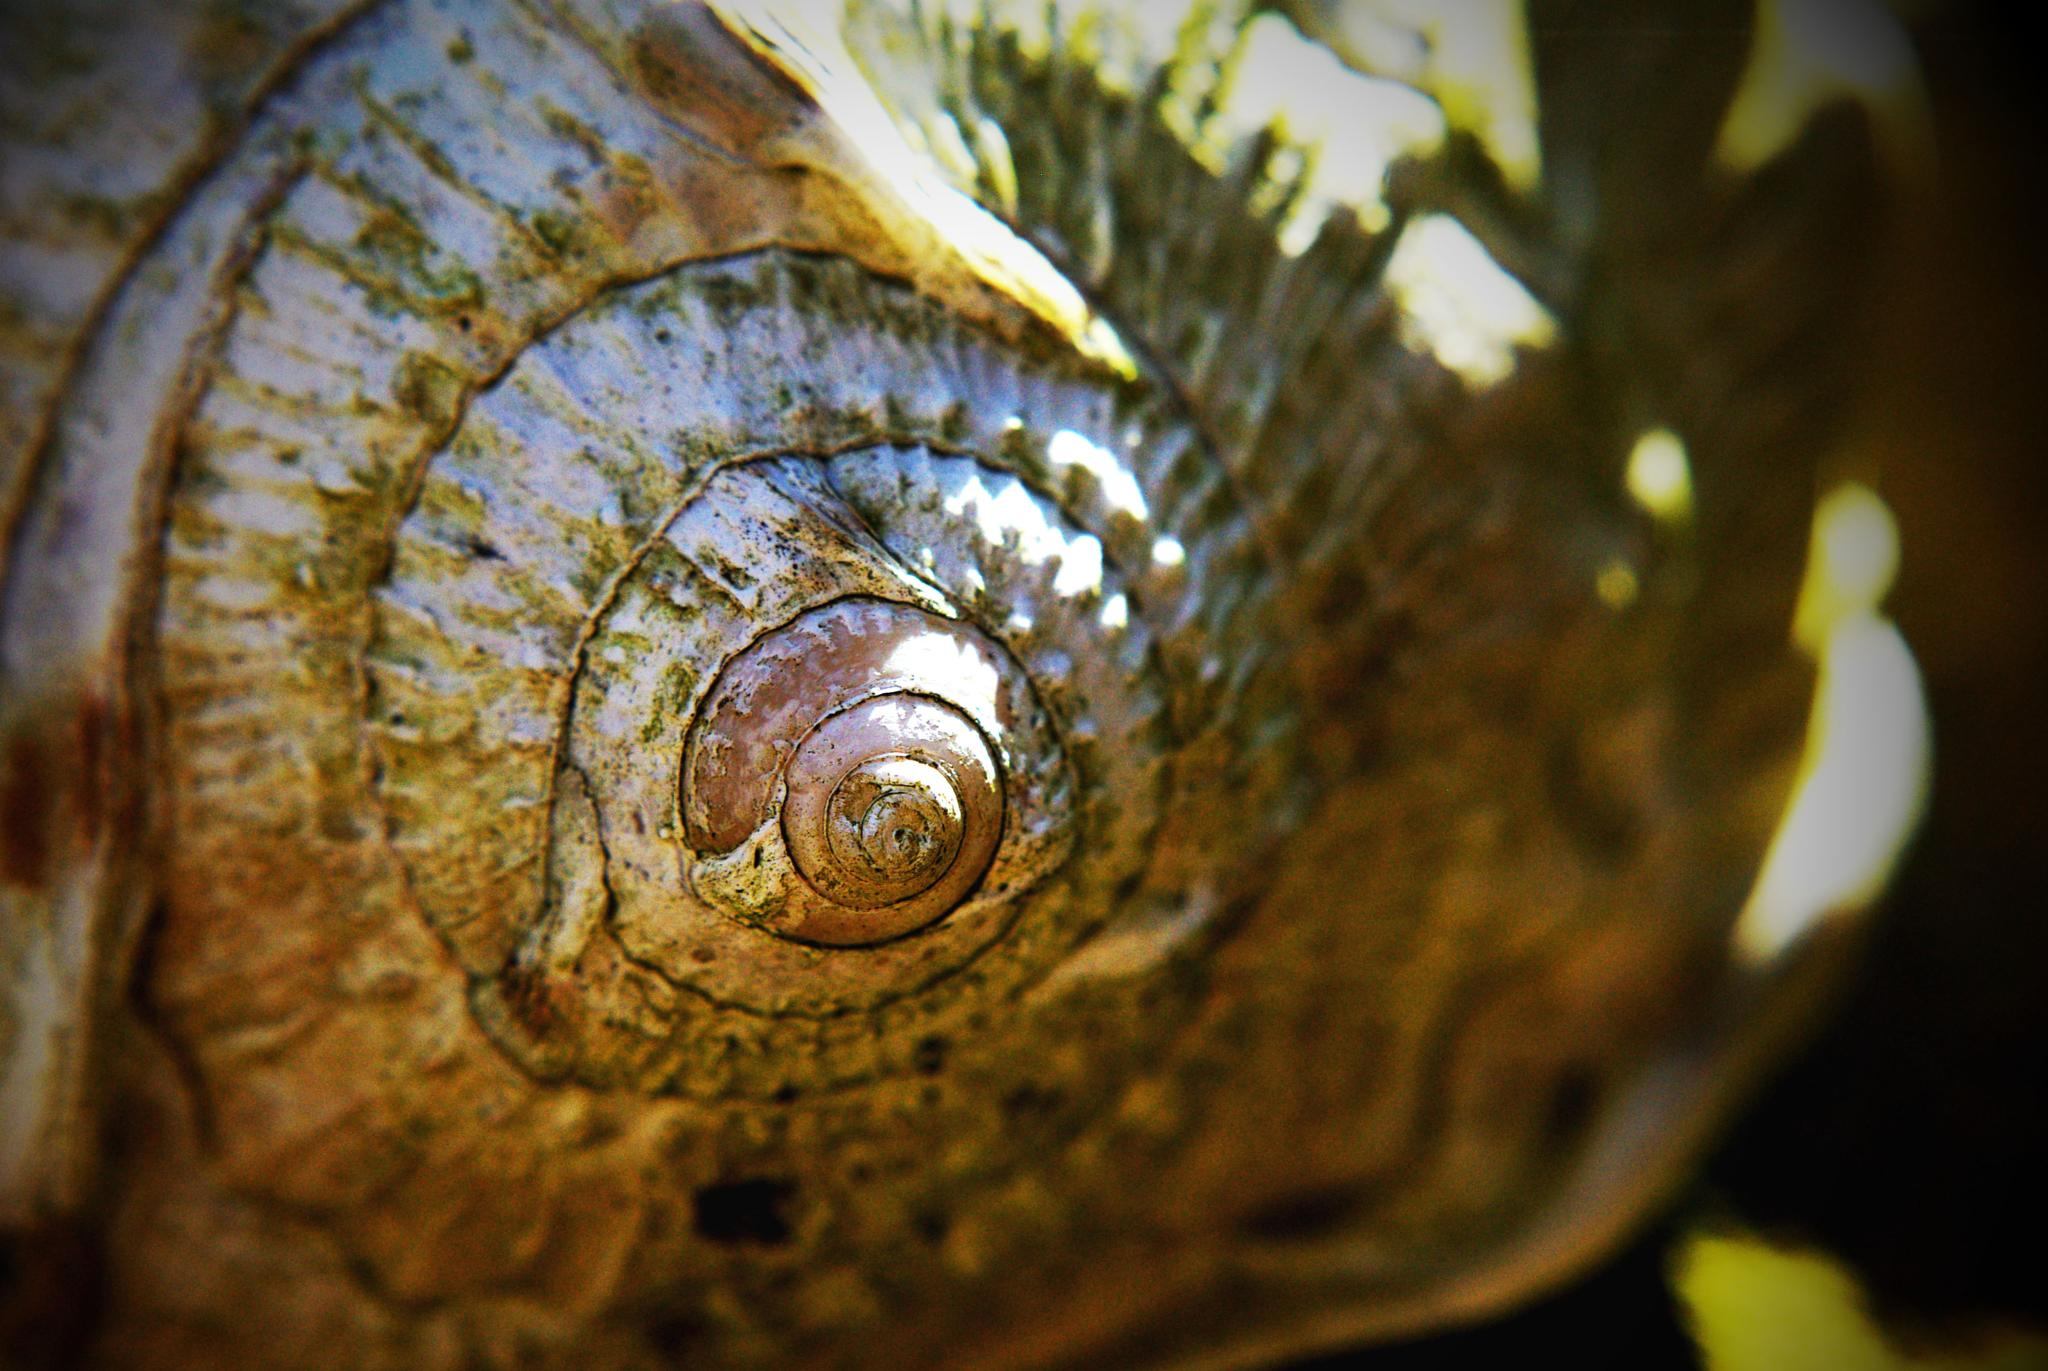 Garden Shell by Kelly-Ann Davies